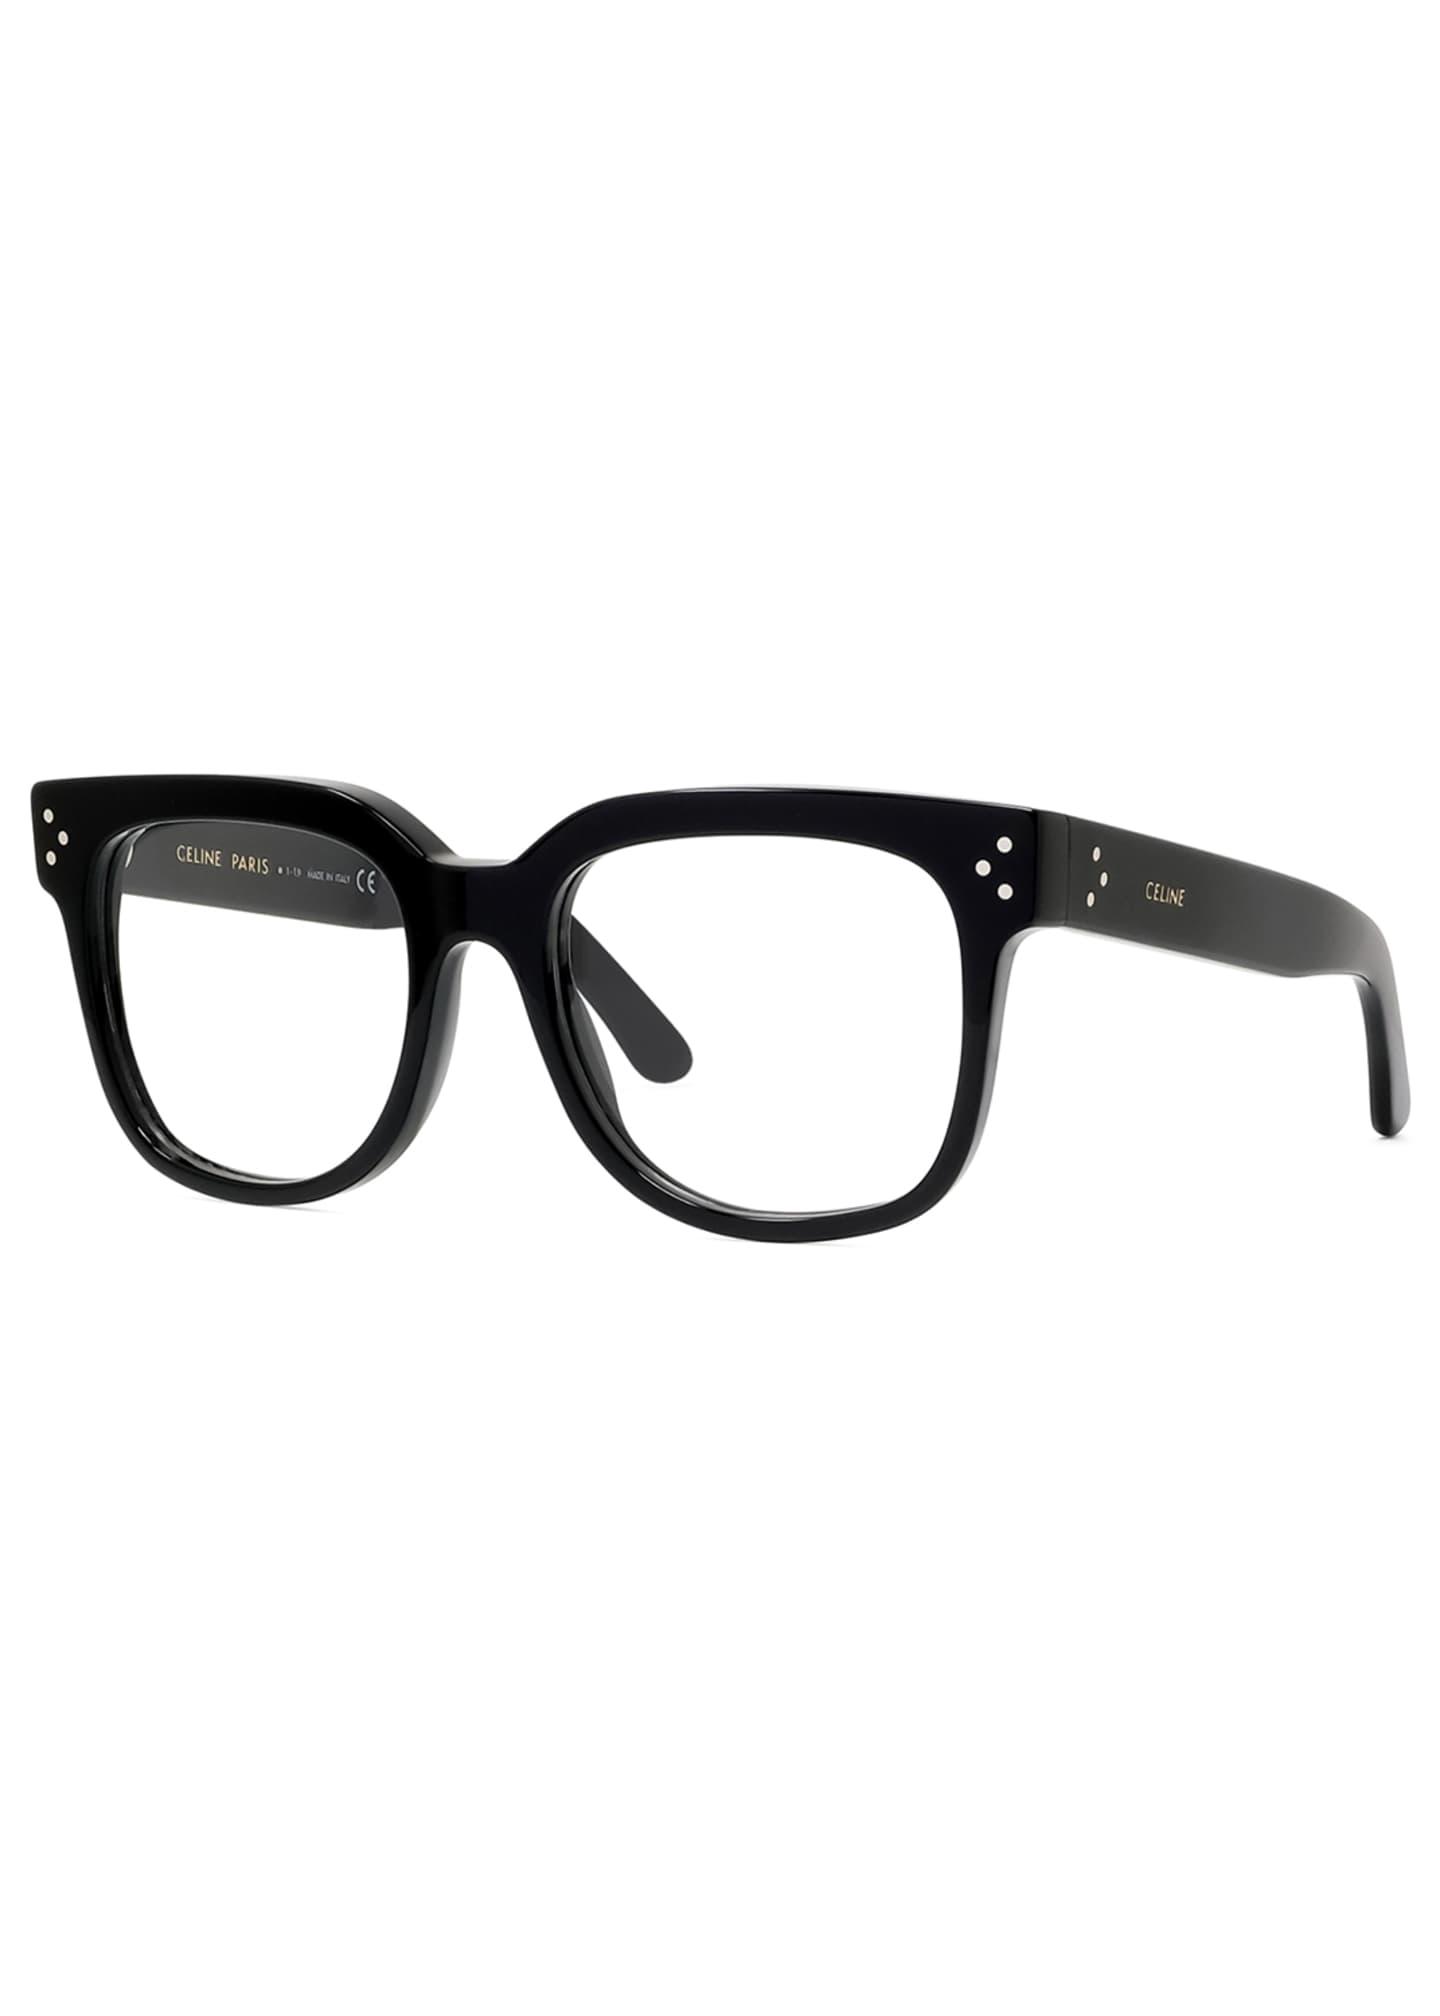 Celine Square Acetate Optical Frames